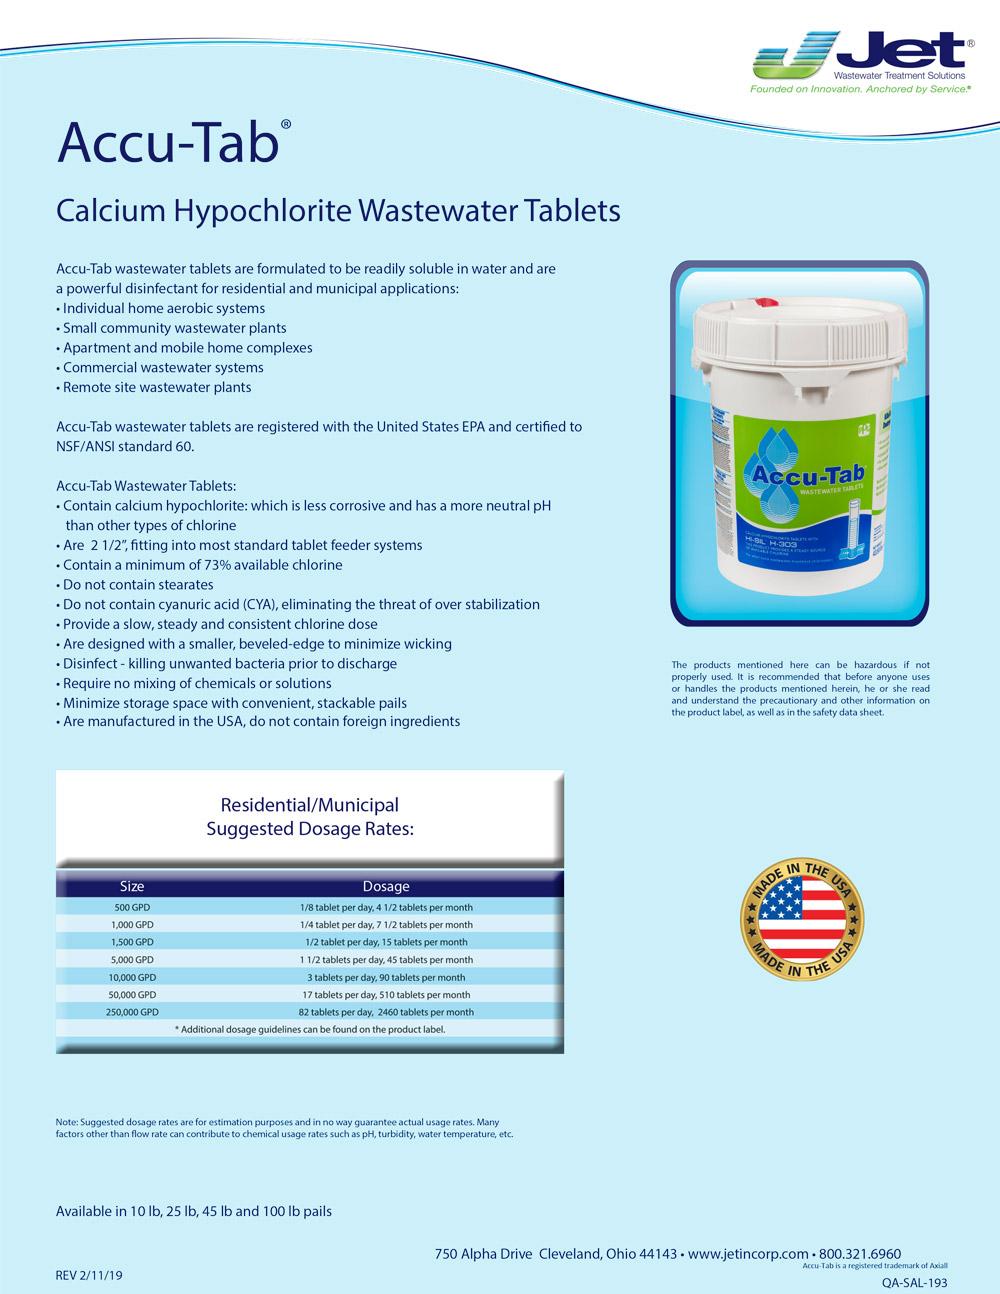 Accu-Tab Calcium Hypochlorite Wastewater Tablets